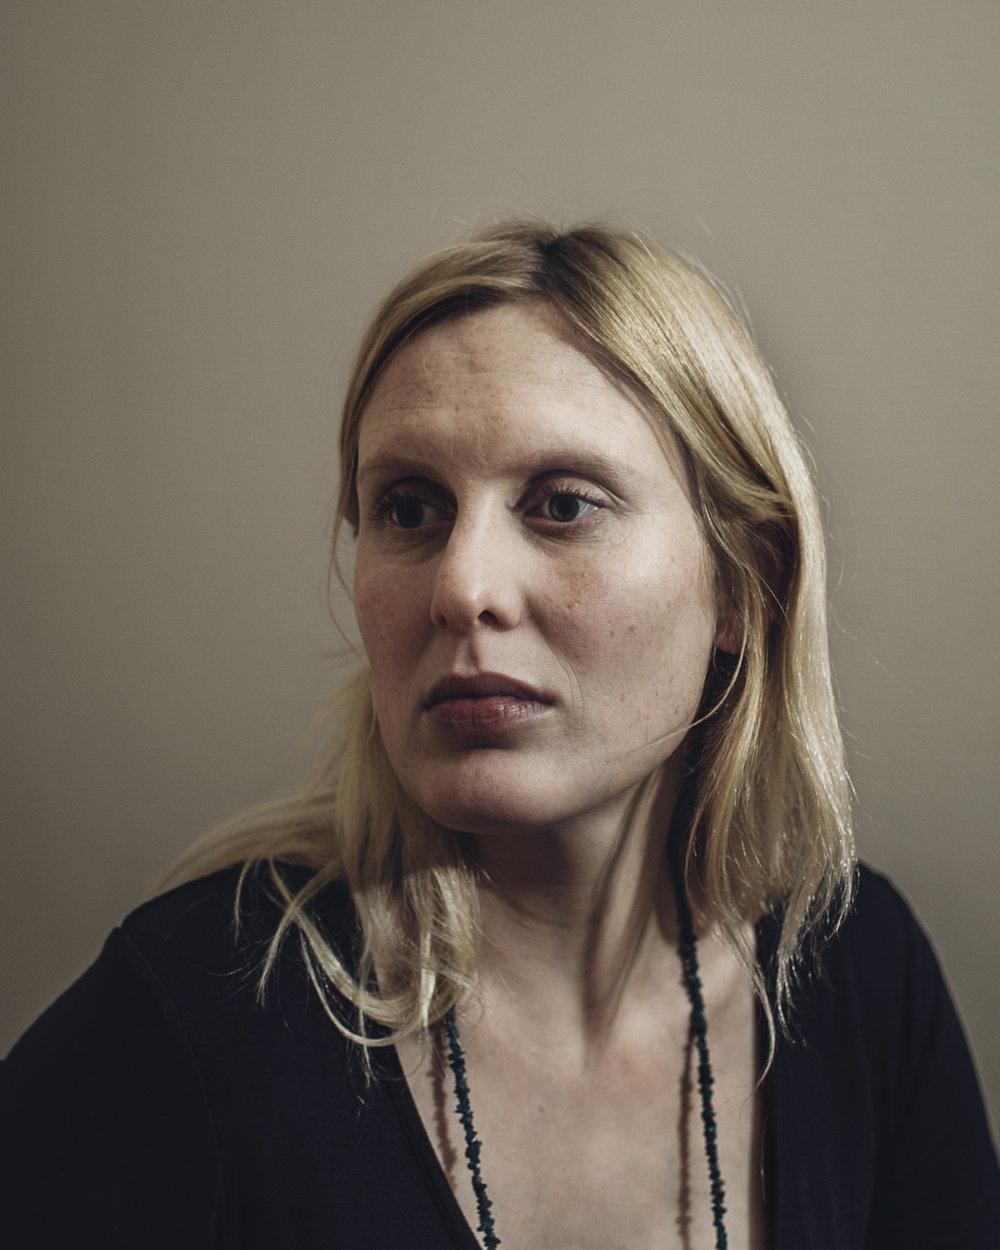 Amy Liptrott, for Galore